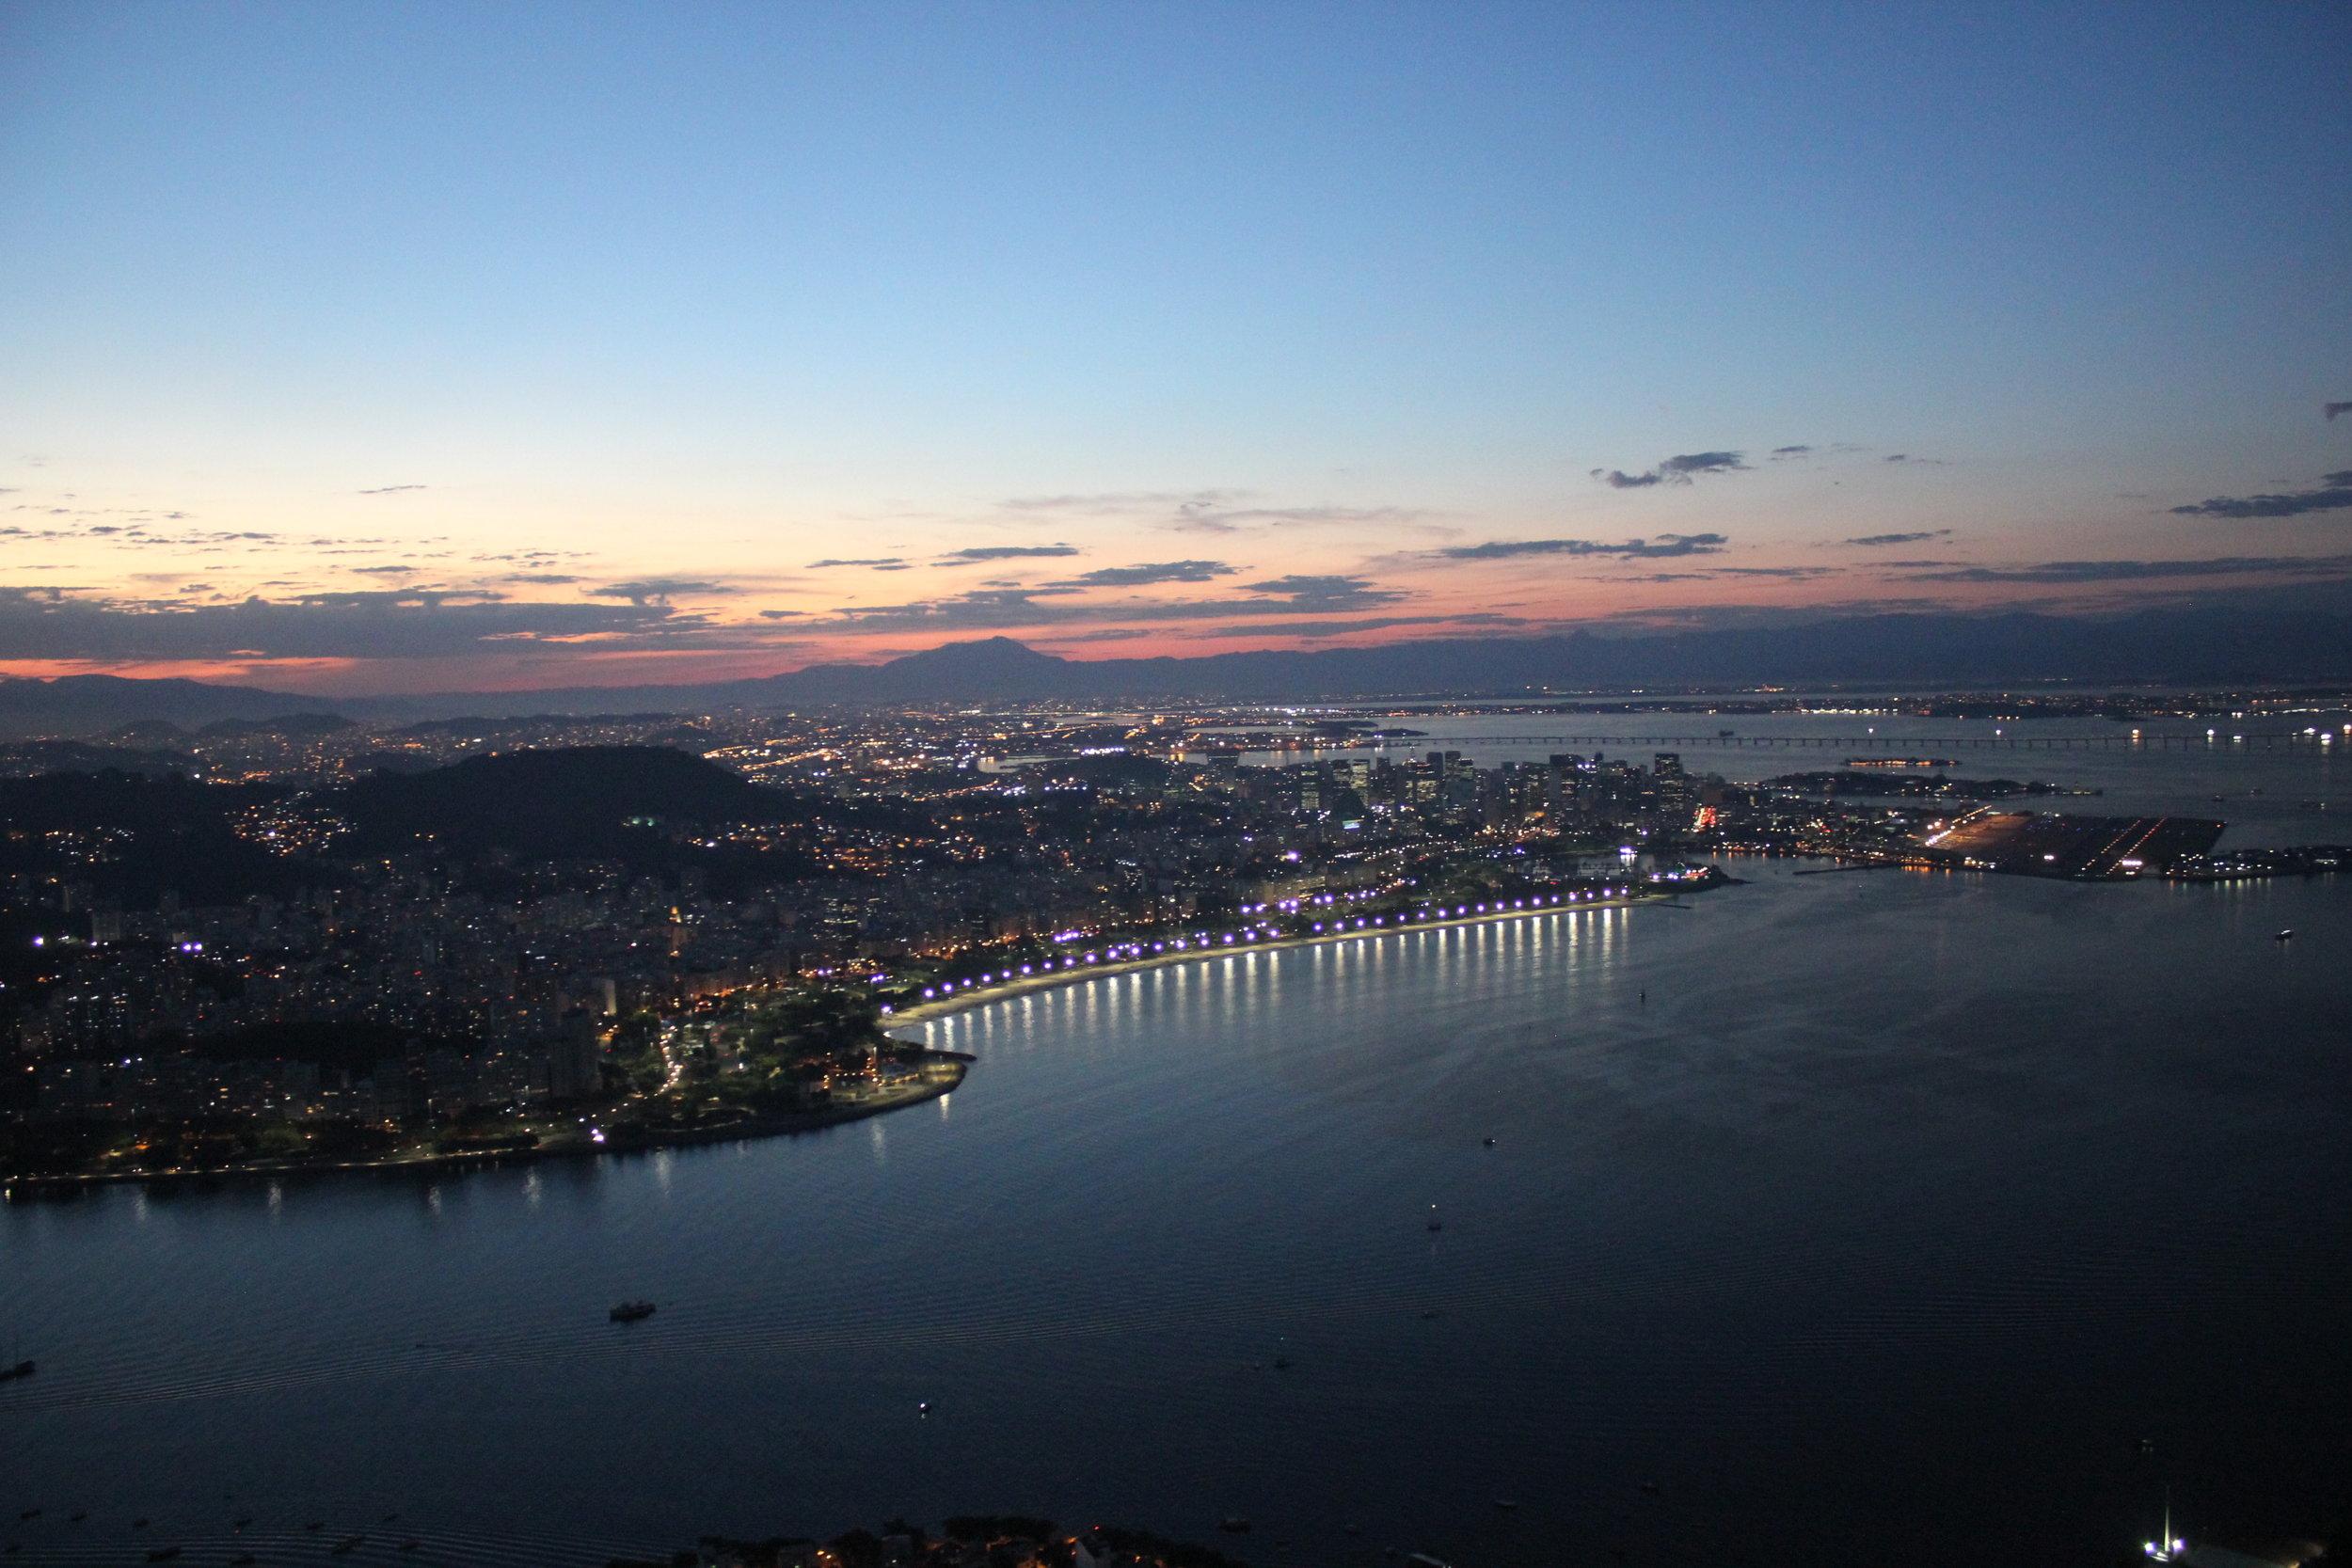 Rio de Janeiro, Brazil – Zona Centro and SDU airport